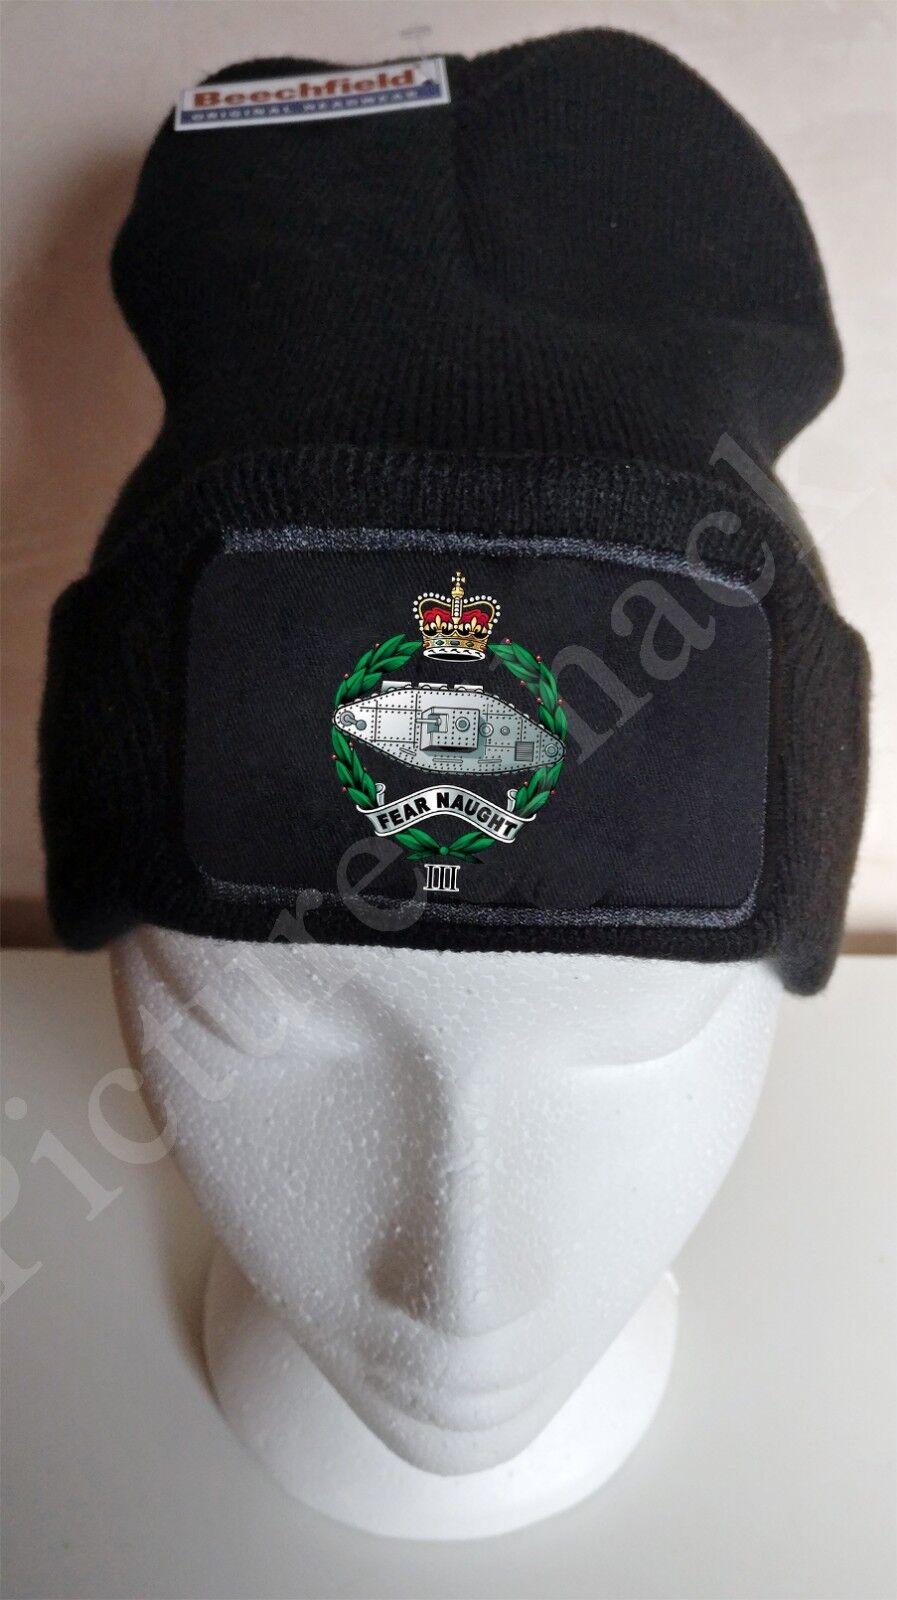 MIDDLESEX REGIMENT CAP BADGE PRINTED ON A BASEBALL CAP.